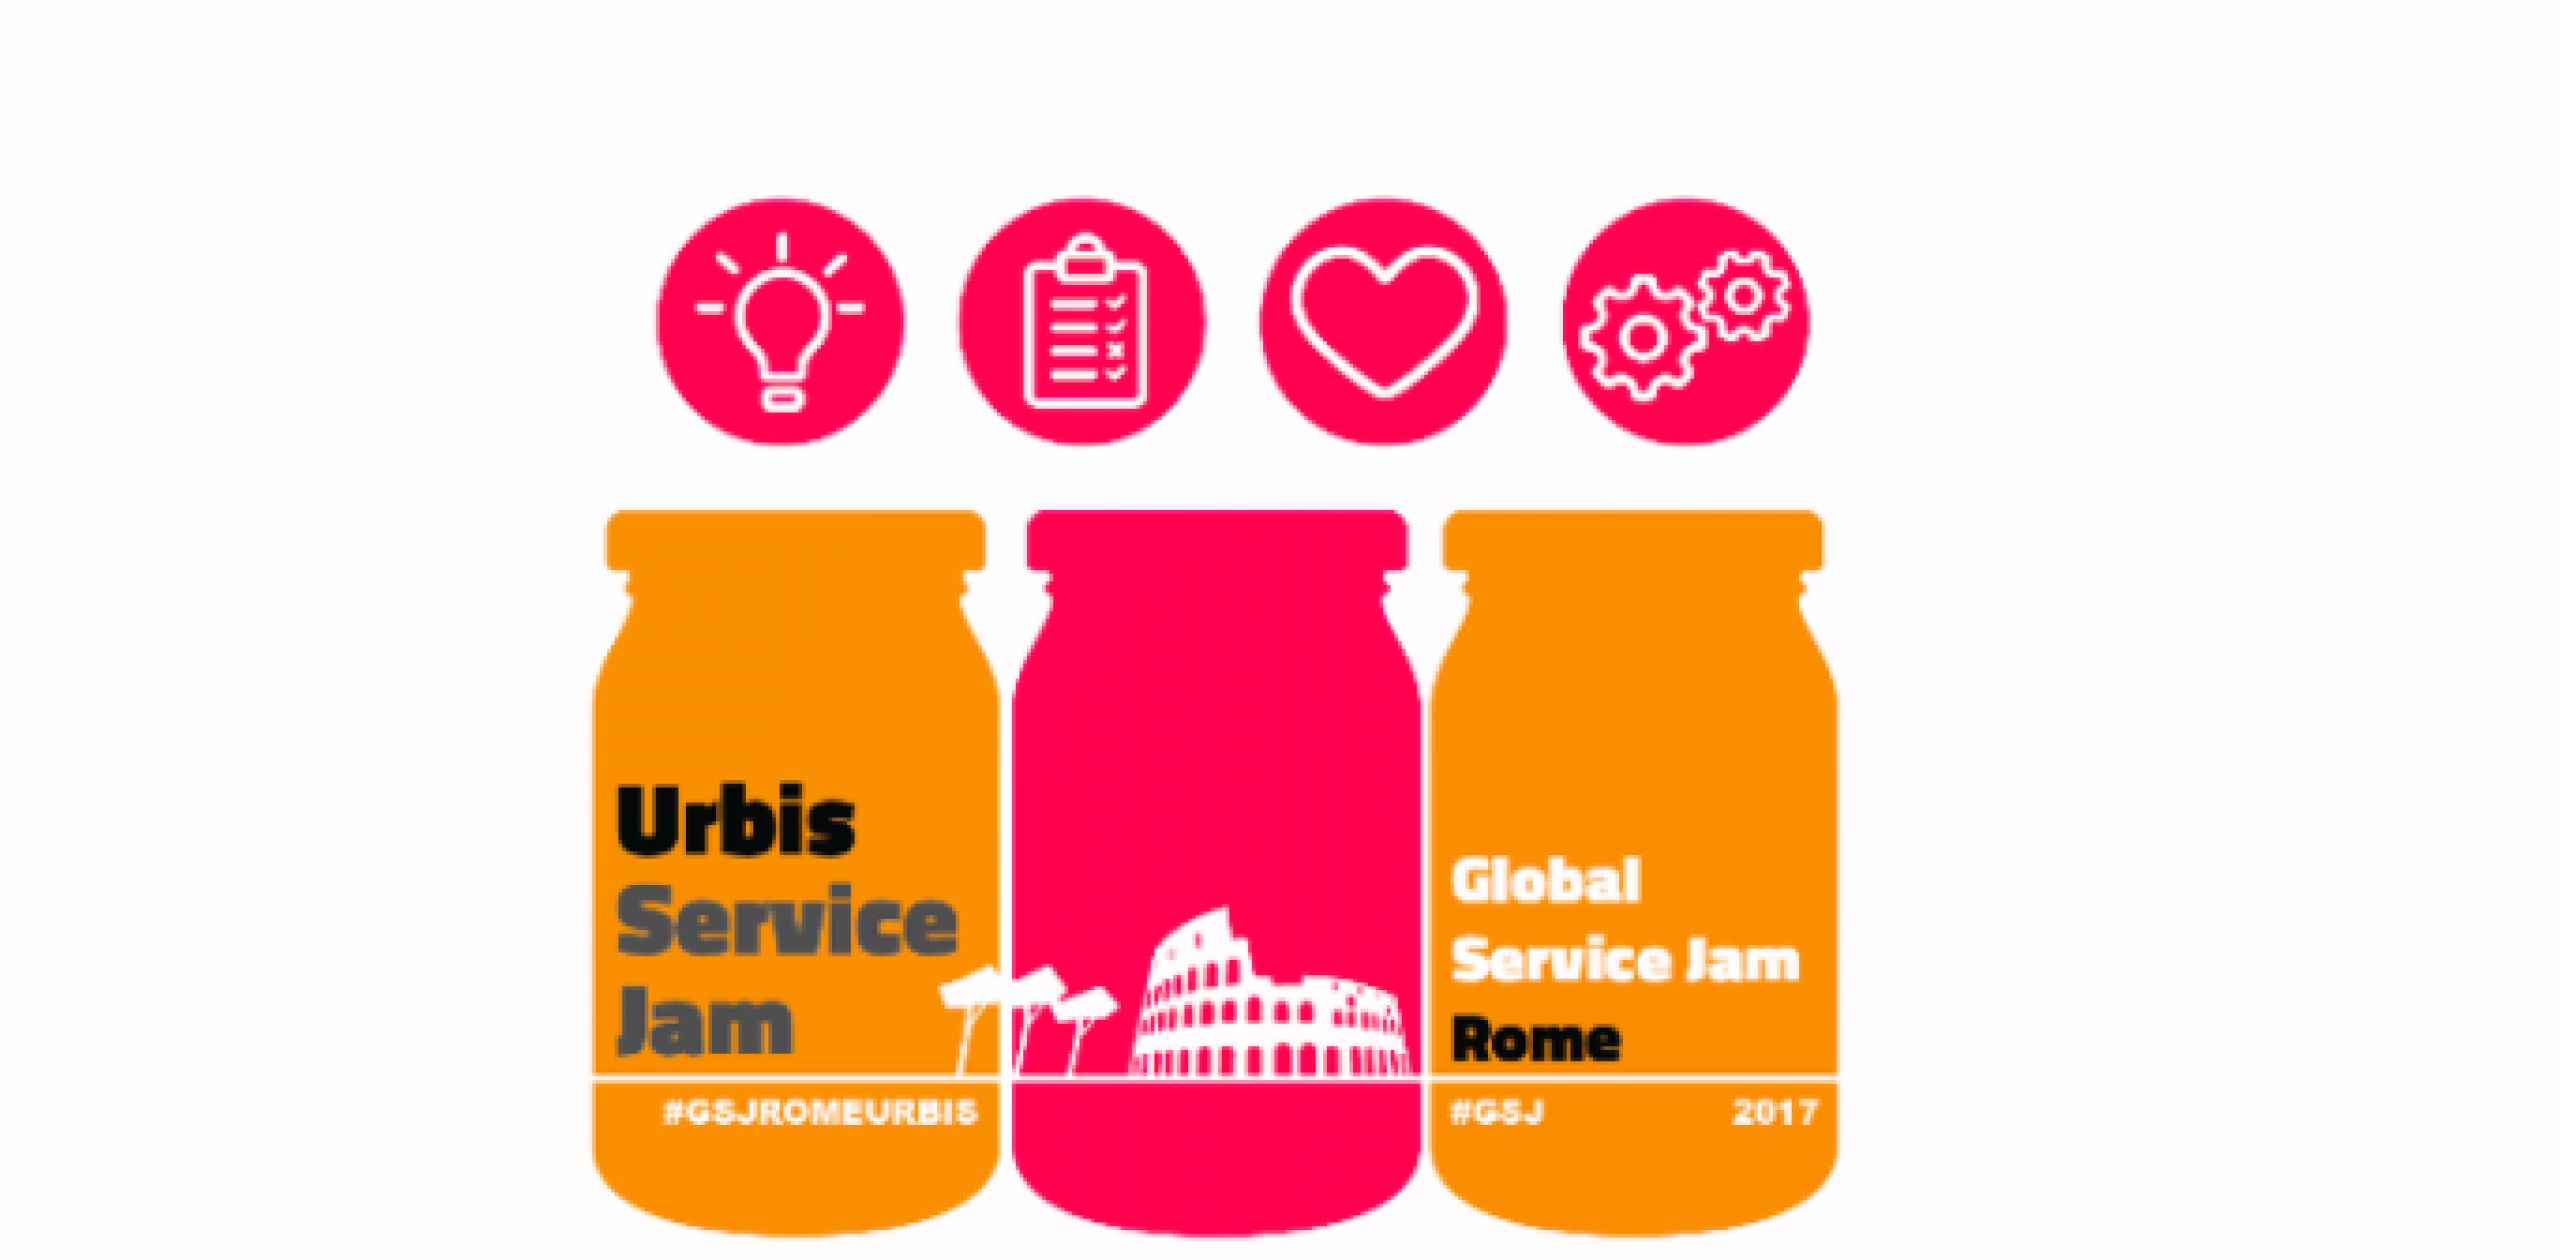 Global Service Jam Rome 2017